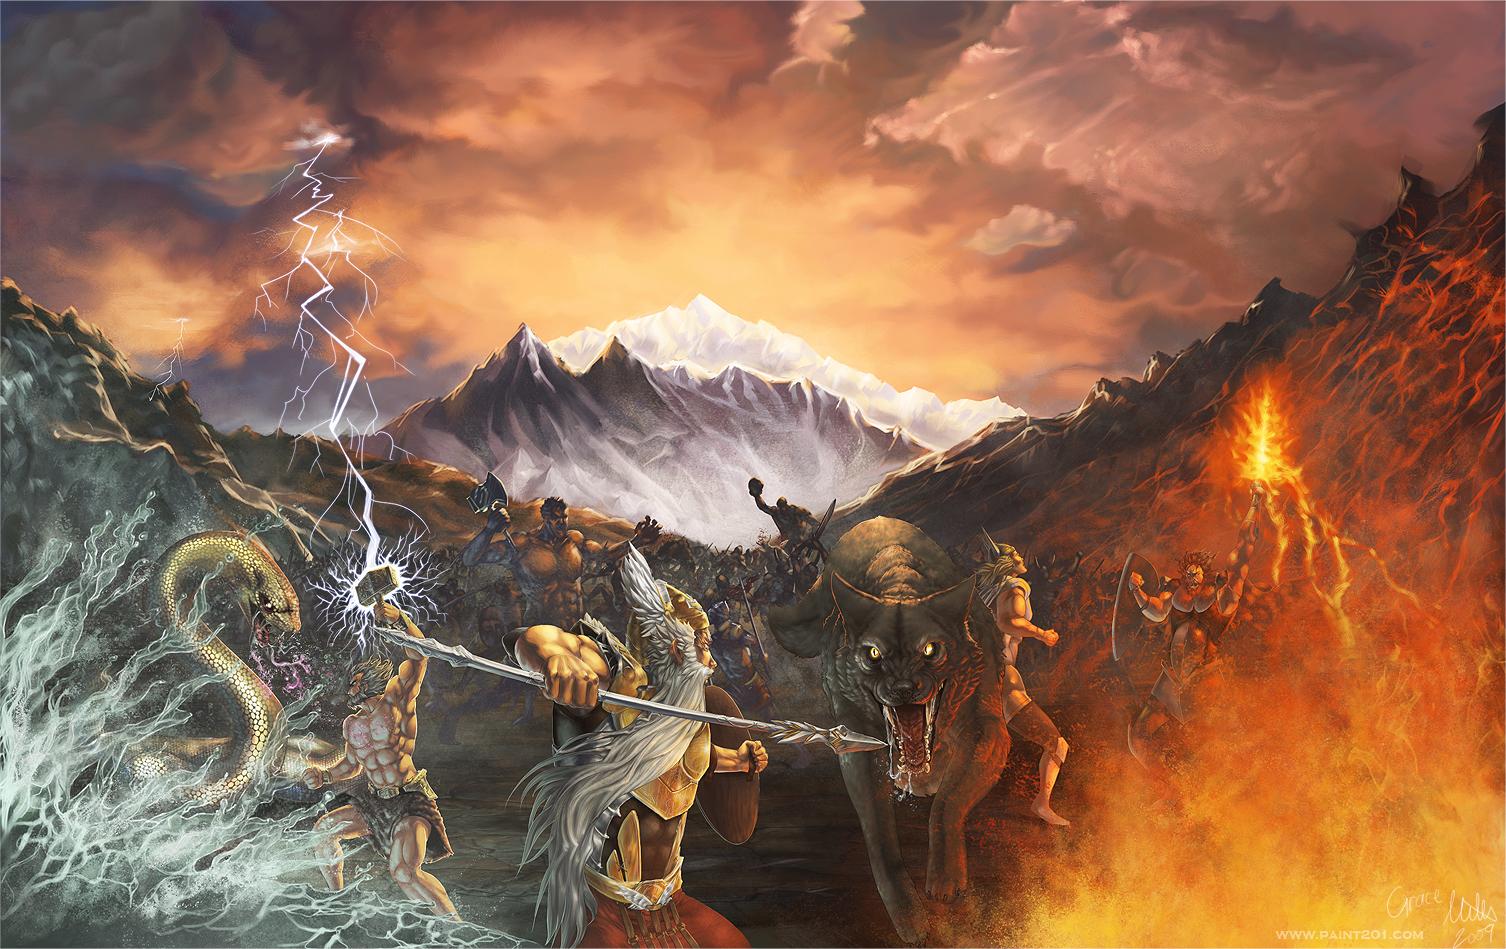 73+] Norse Wallpaper on WallpaperSafari